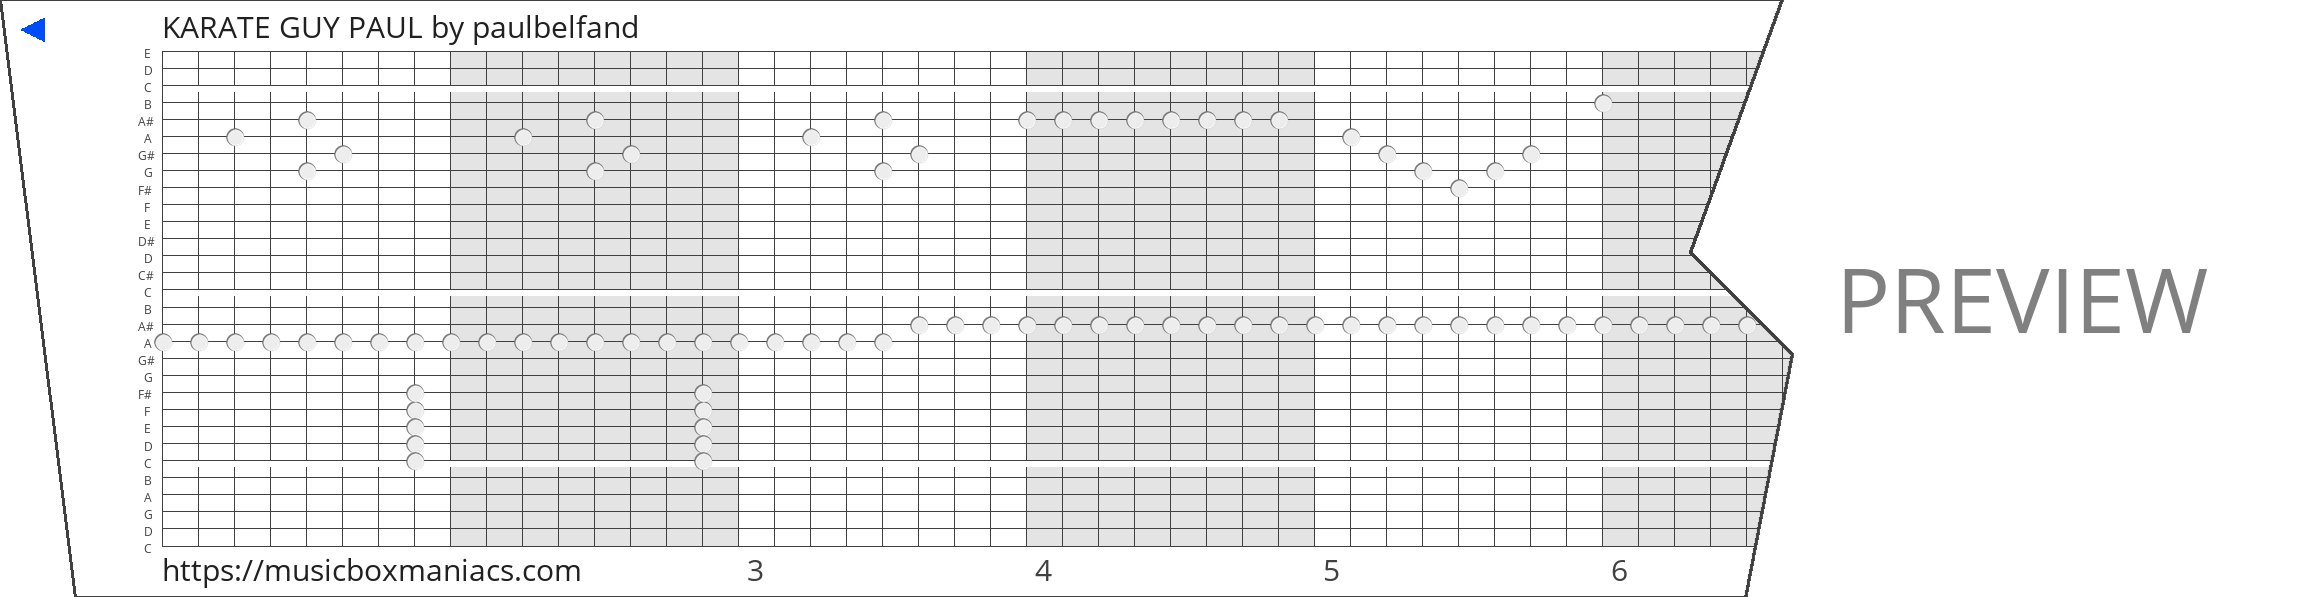 KARATE GUY PAUL 30 note music box paper strip